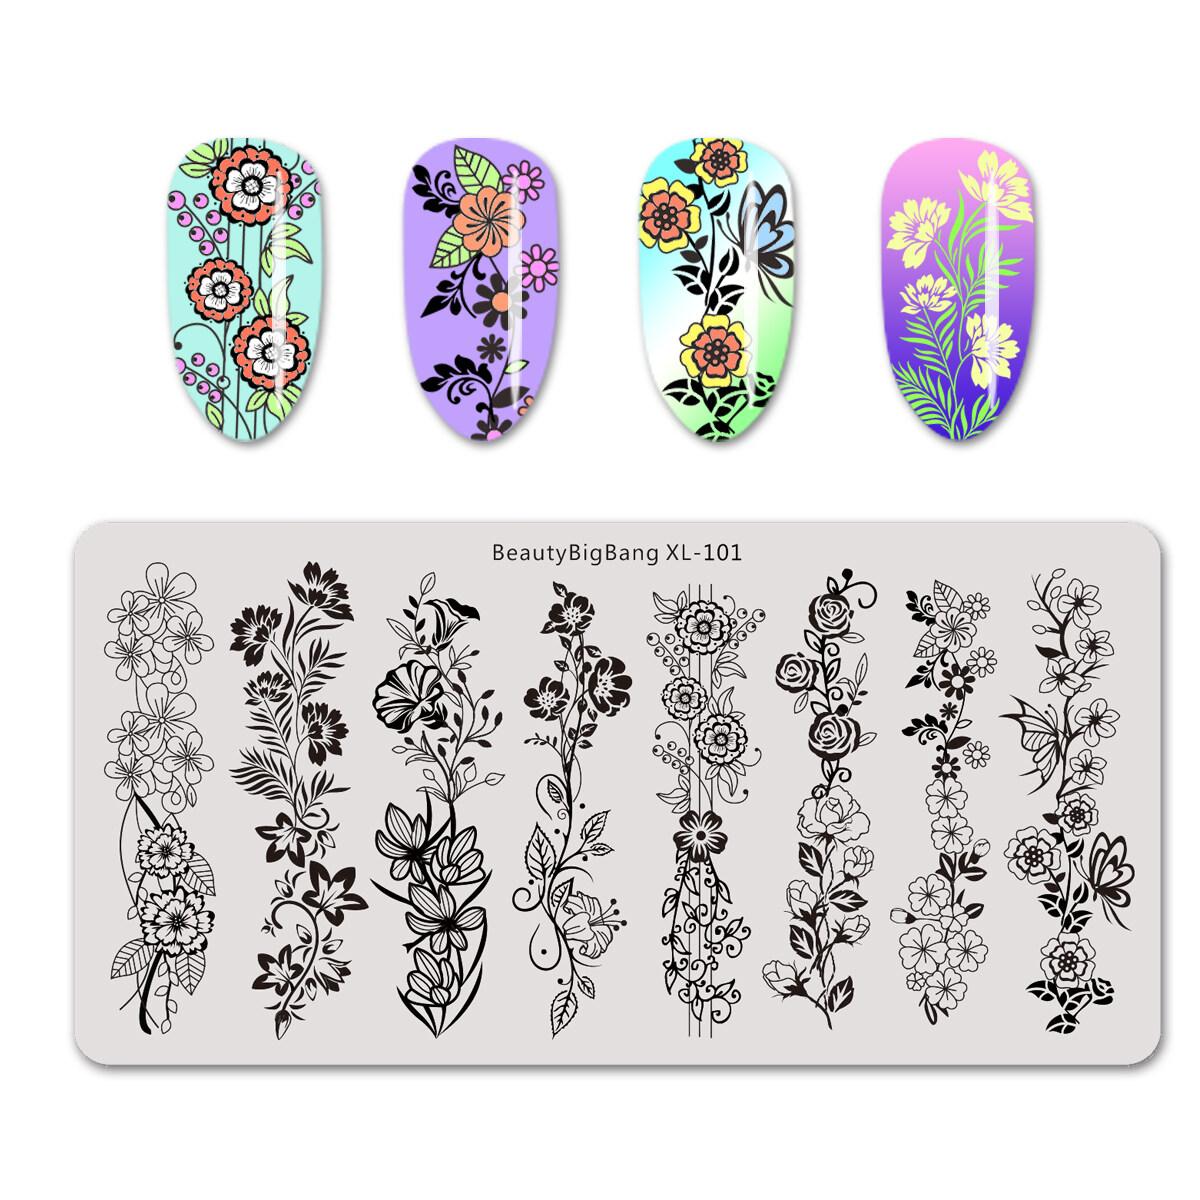 BeautyBigbang 6*12cm 1Pc Rectangle Nail Stamping Plates Flower Vine Patterns Nail Art Stamp XL-101